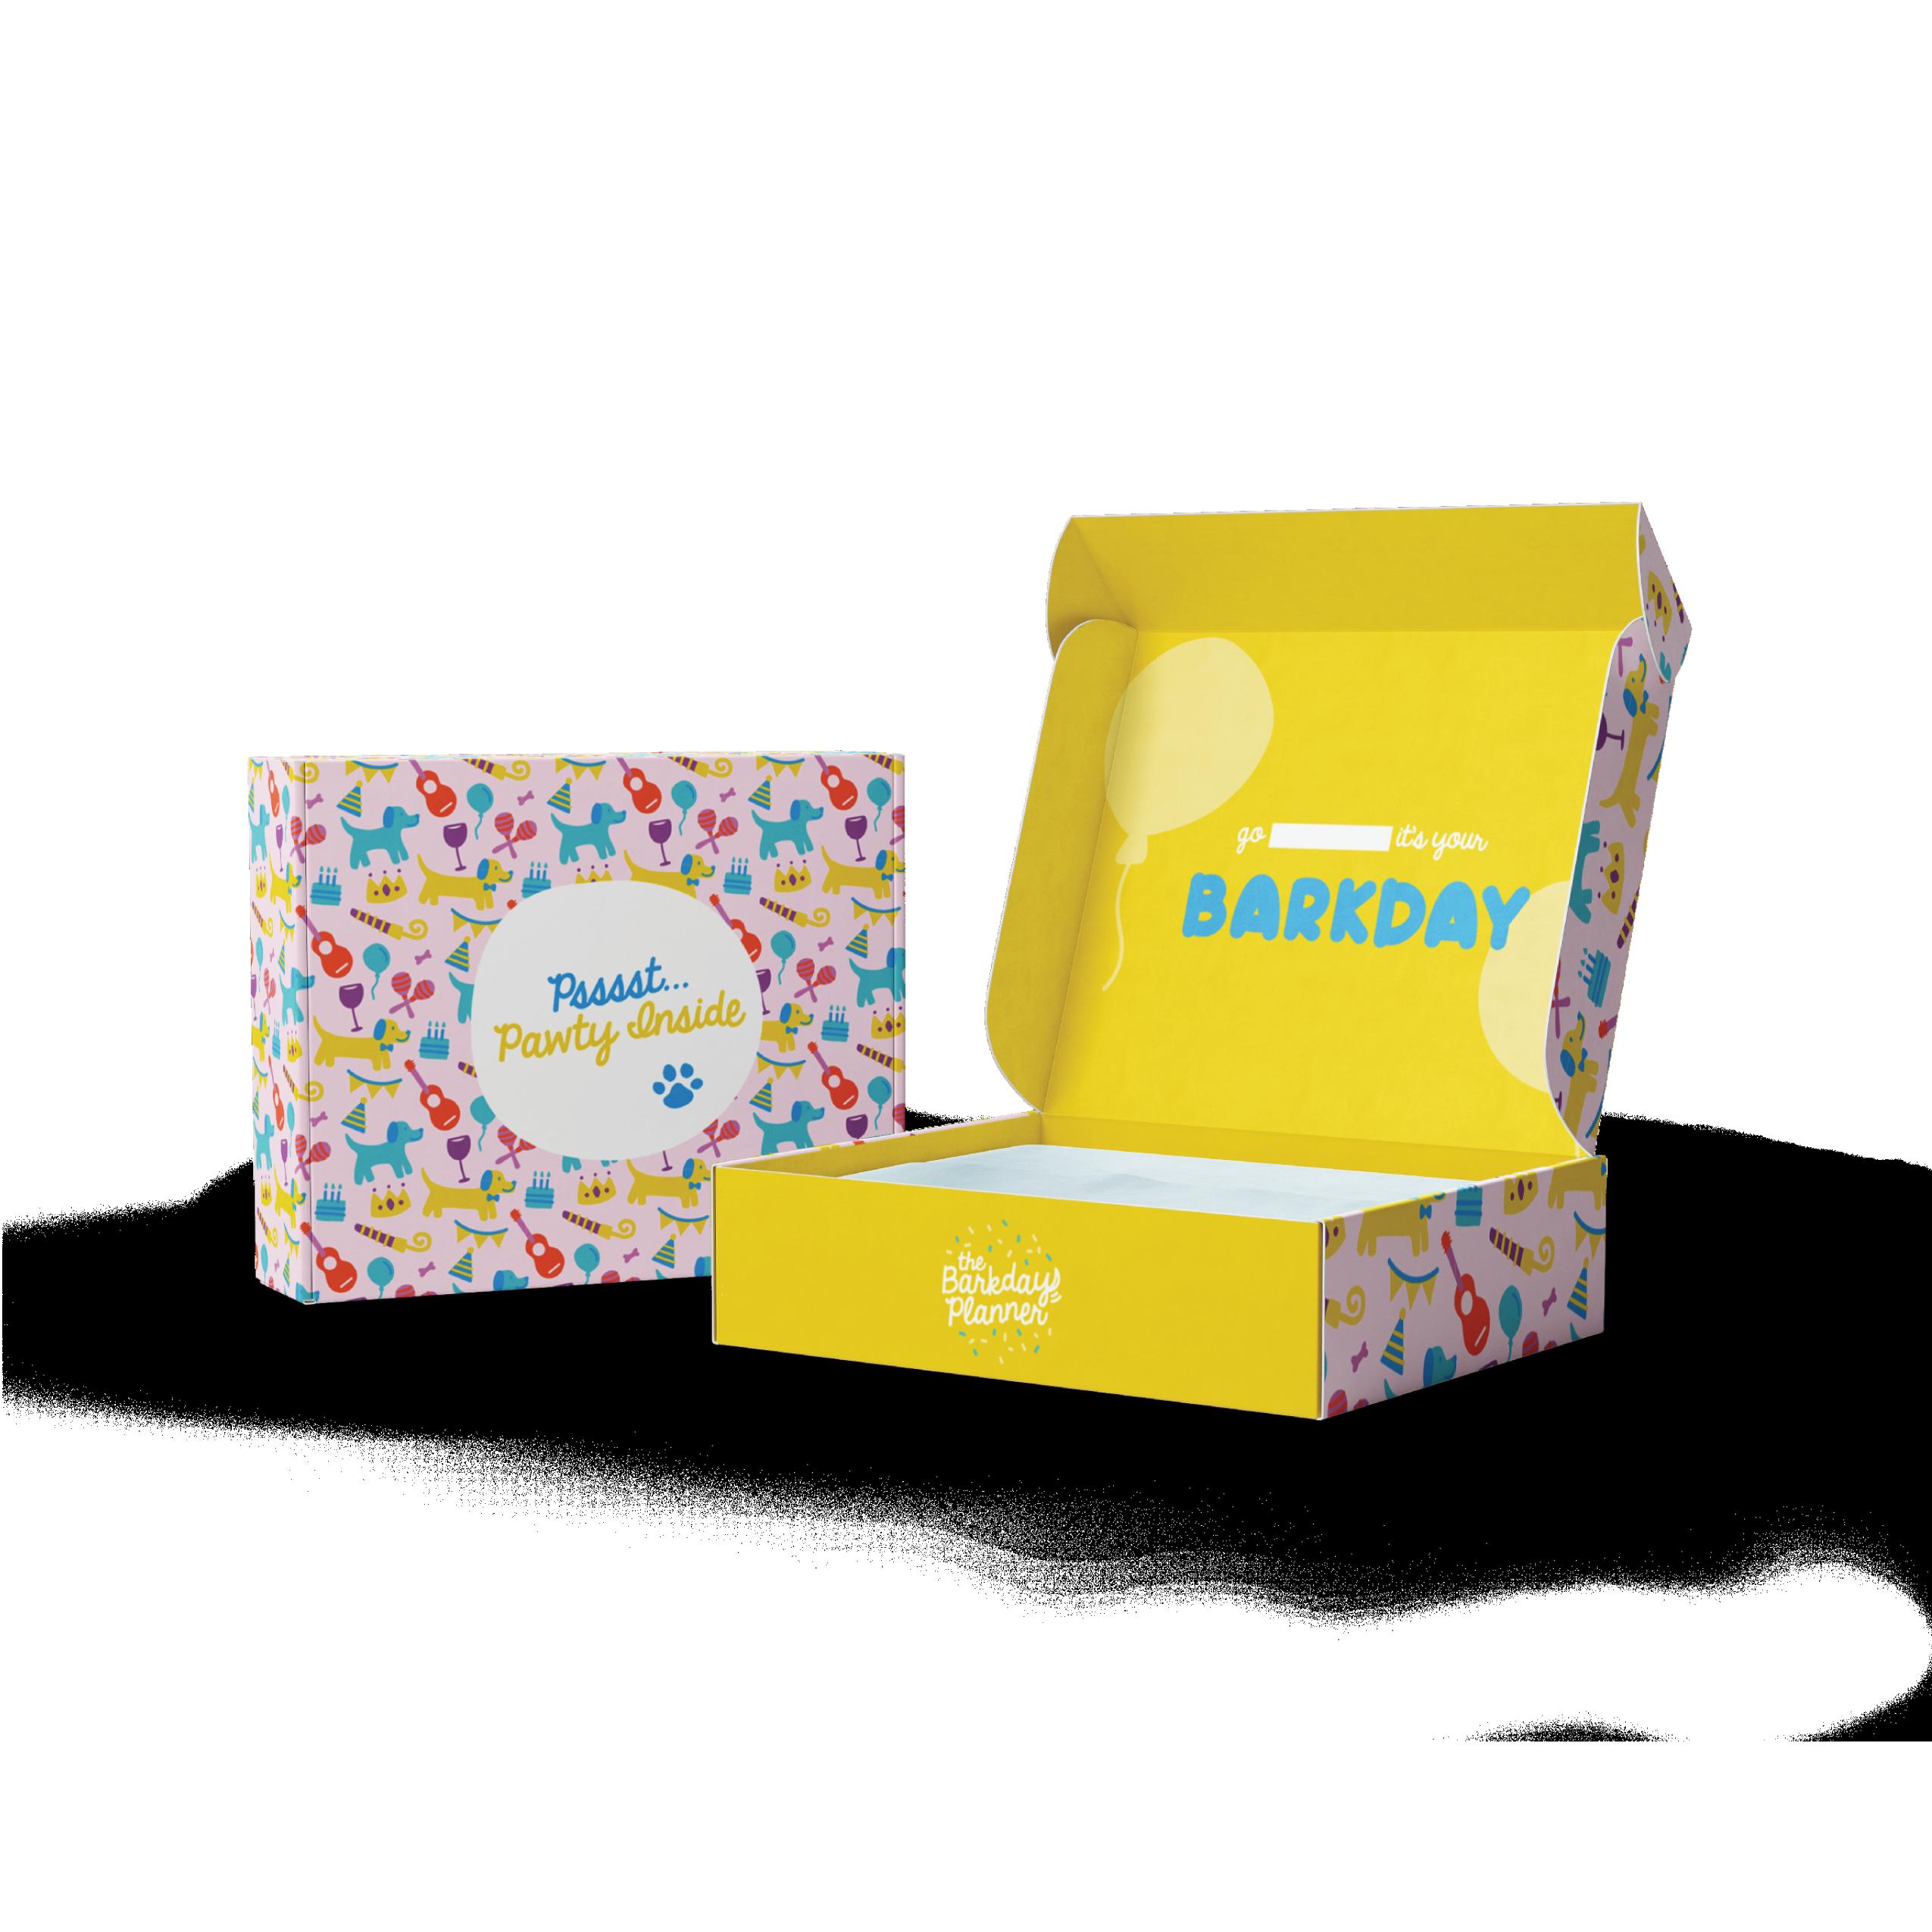 Barkday pattern box and open box showing yellow inside